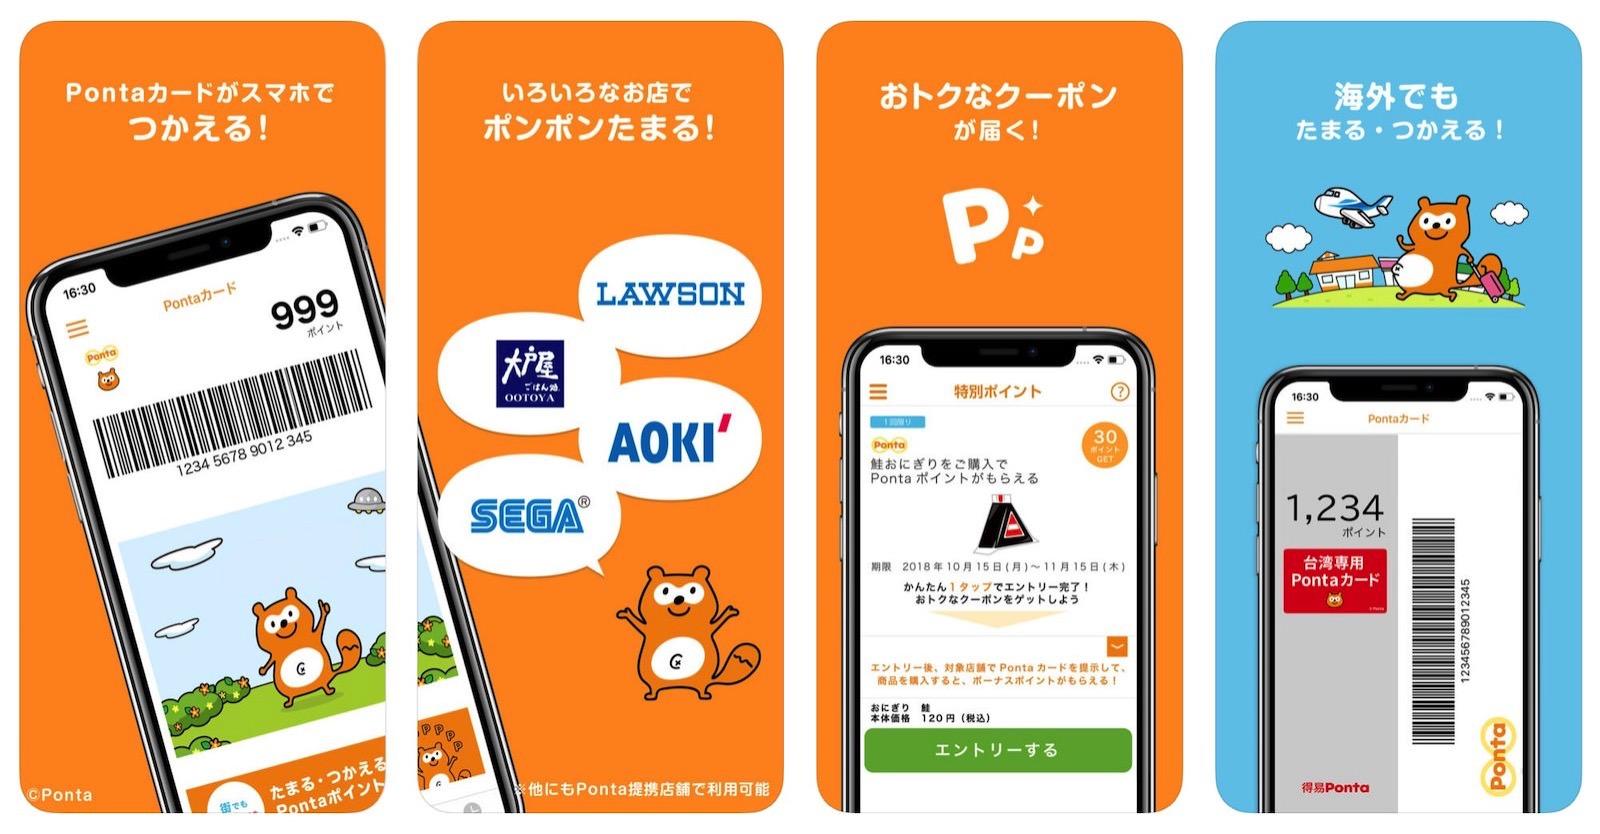 Ponta card app